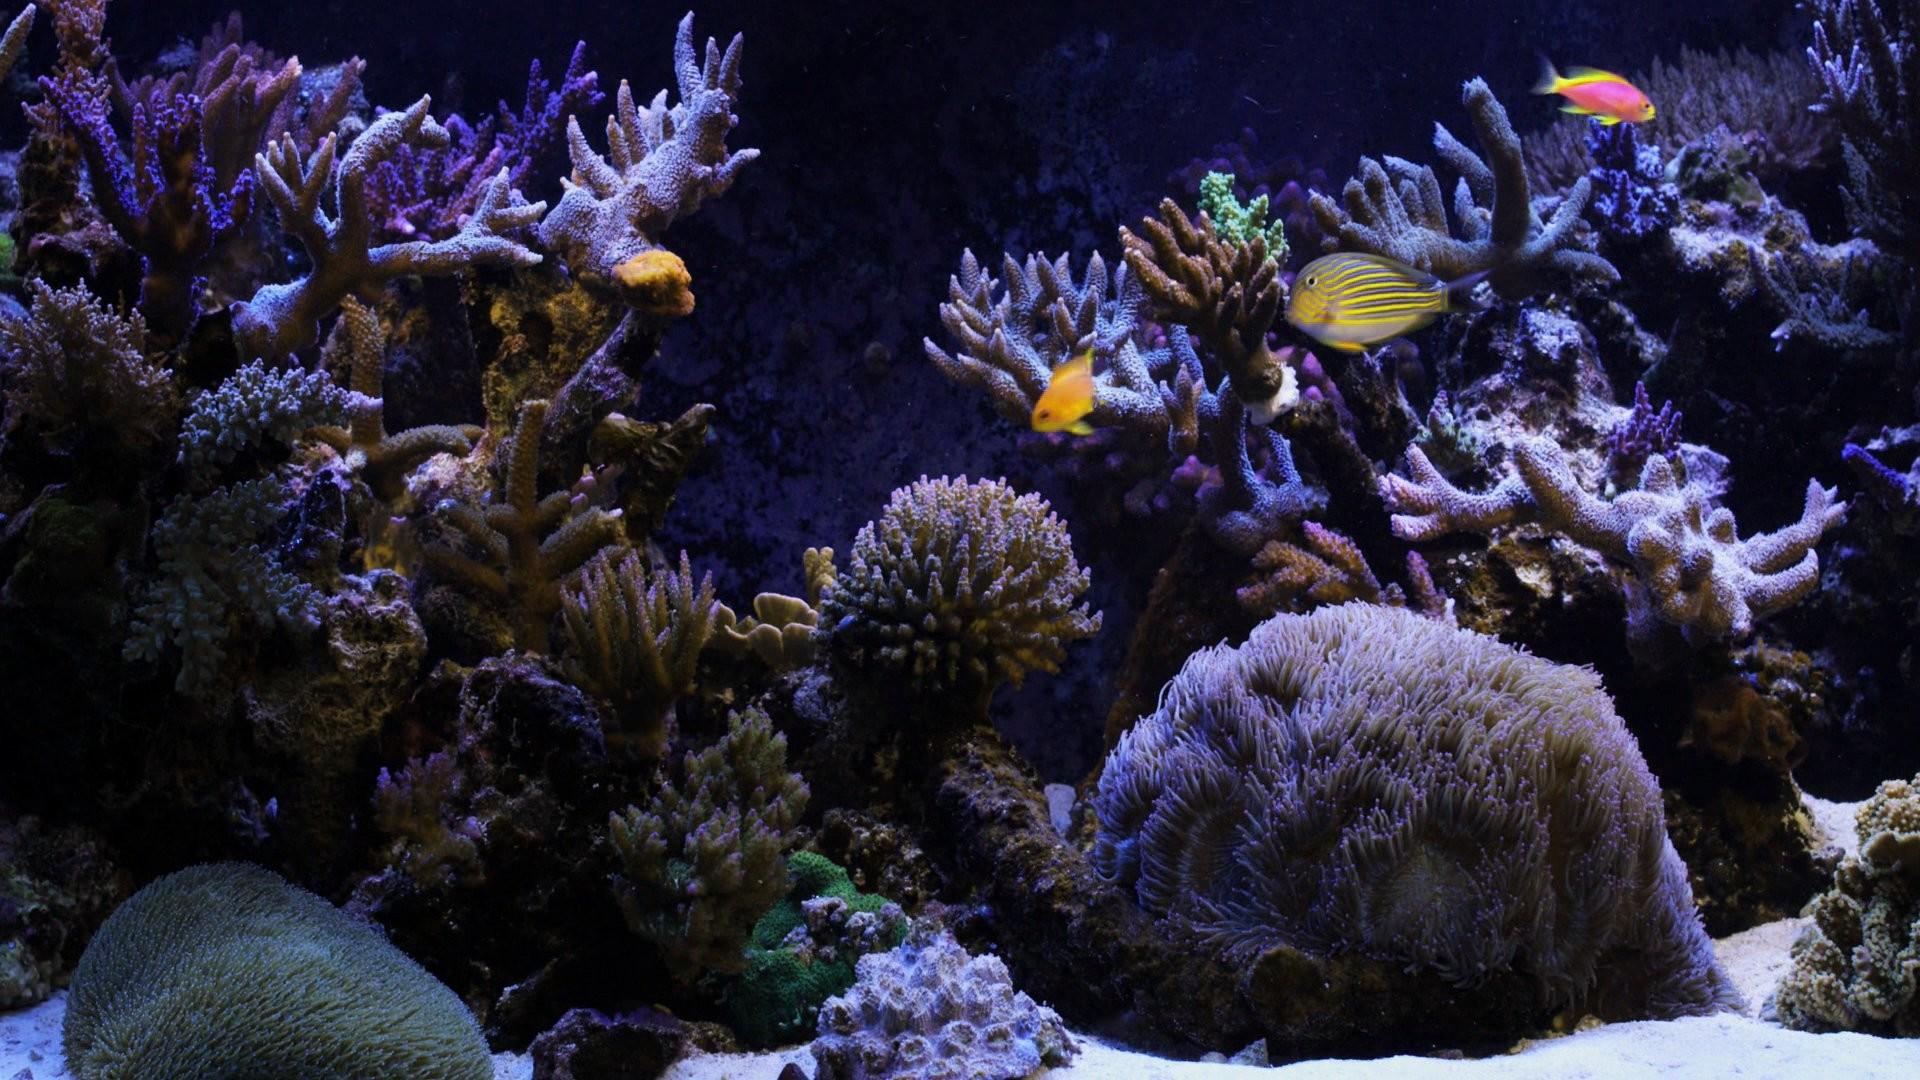 Watery Desktop 3d Live Wallpaper And Screensaver Aquarium Live Wallpaper For Pc 55 Images